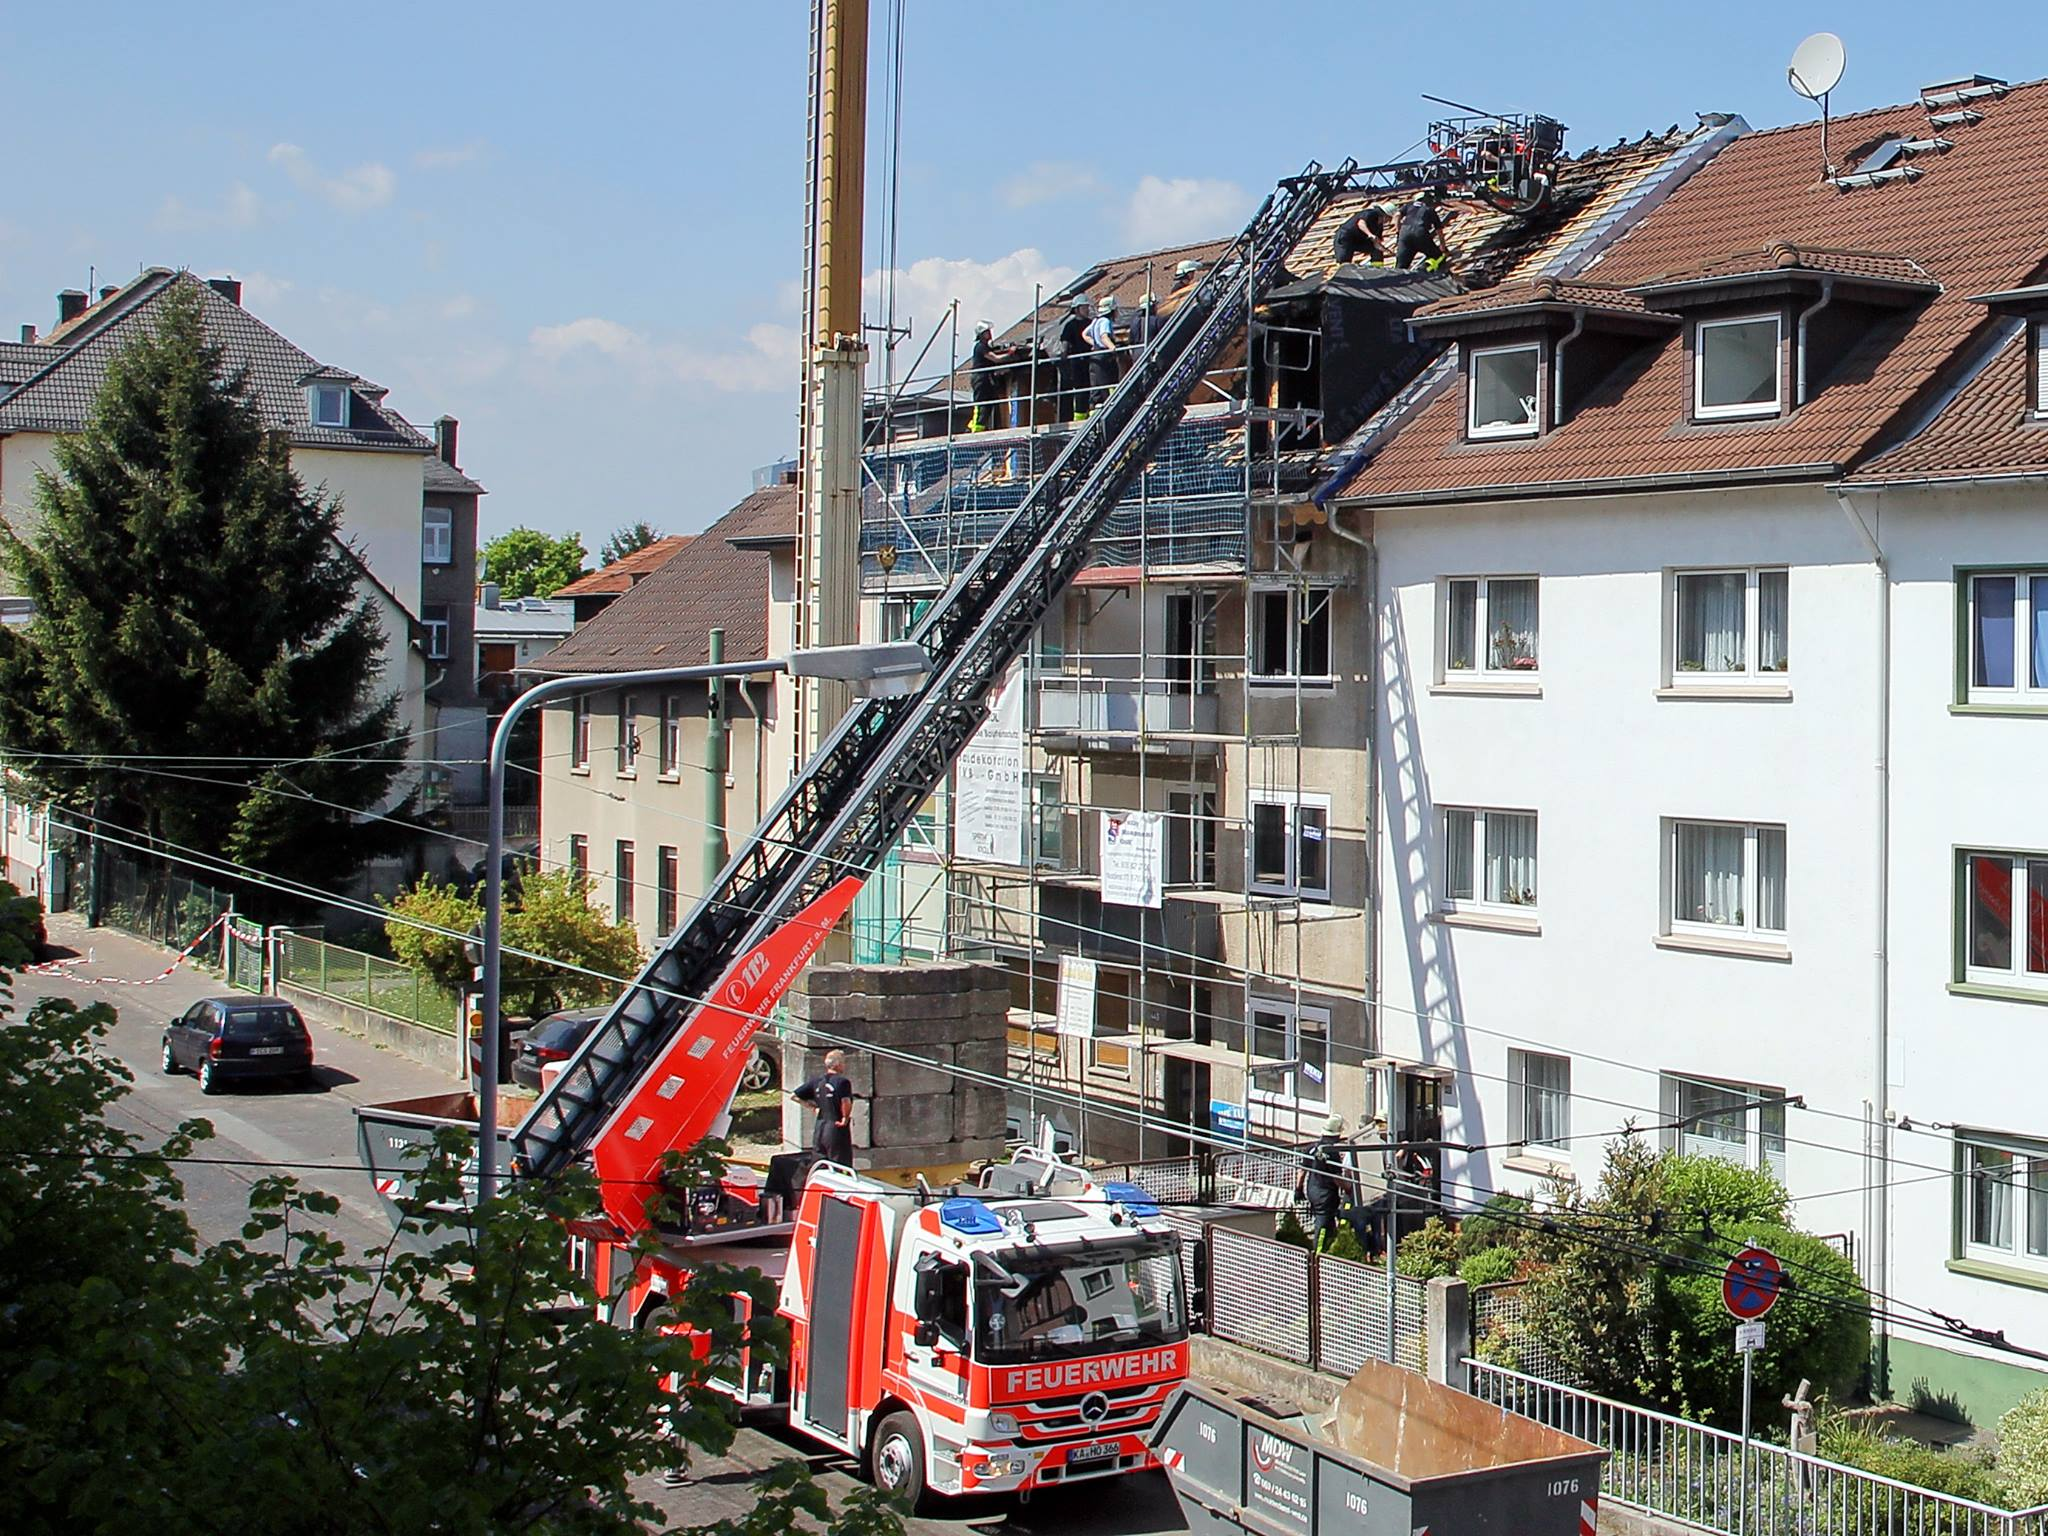 Brand Oberrad 23.04.2014 Offenbacher Landstraße - Aufräumarbeiten Foto: Michael Dengler